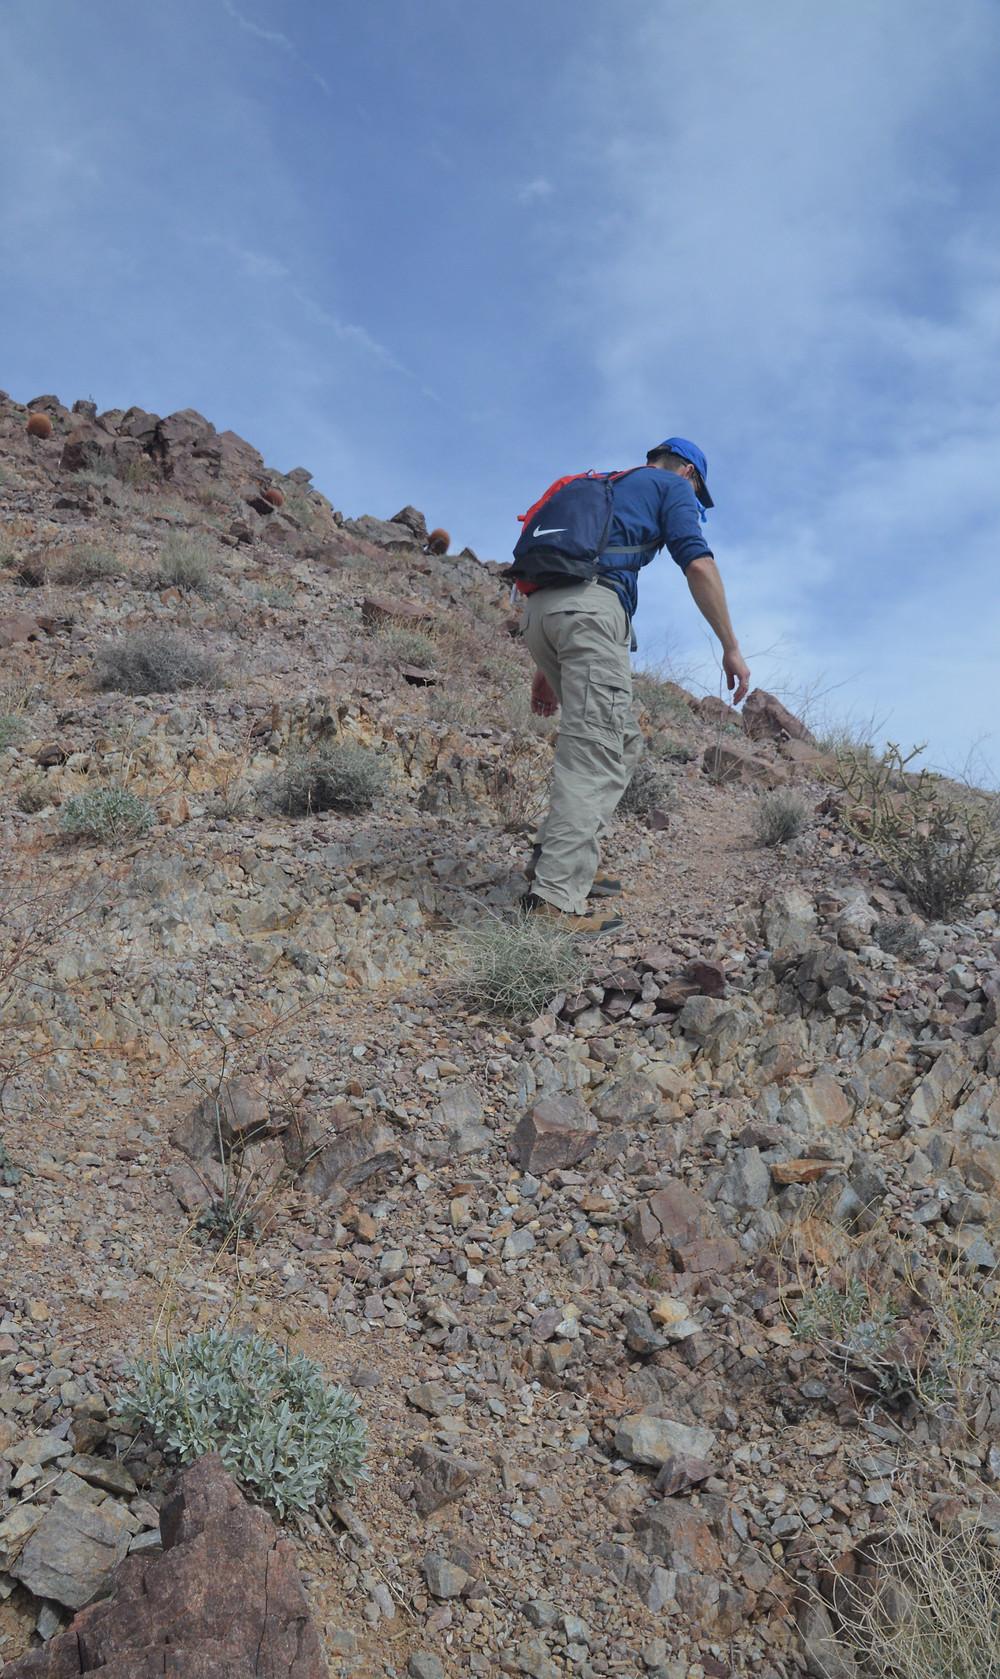 Hiking ridgeline on path to Pinto Mountain summit in Joshua Tree National Park